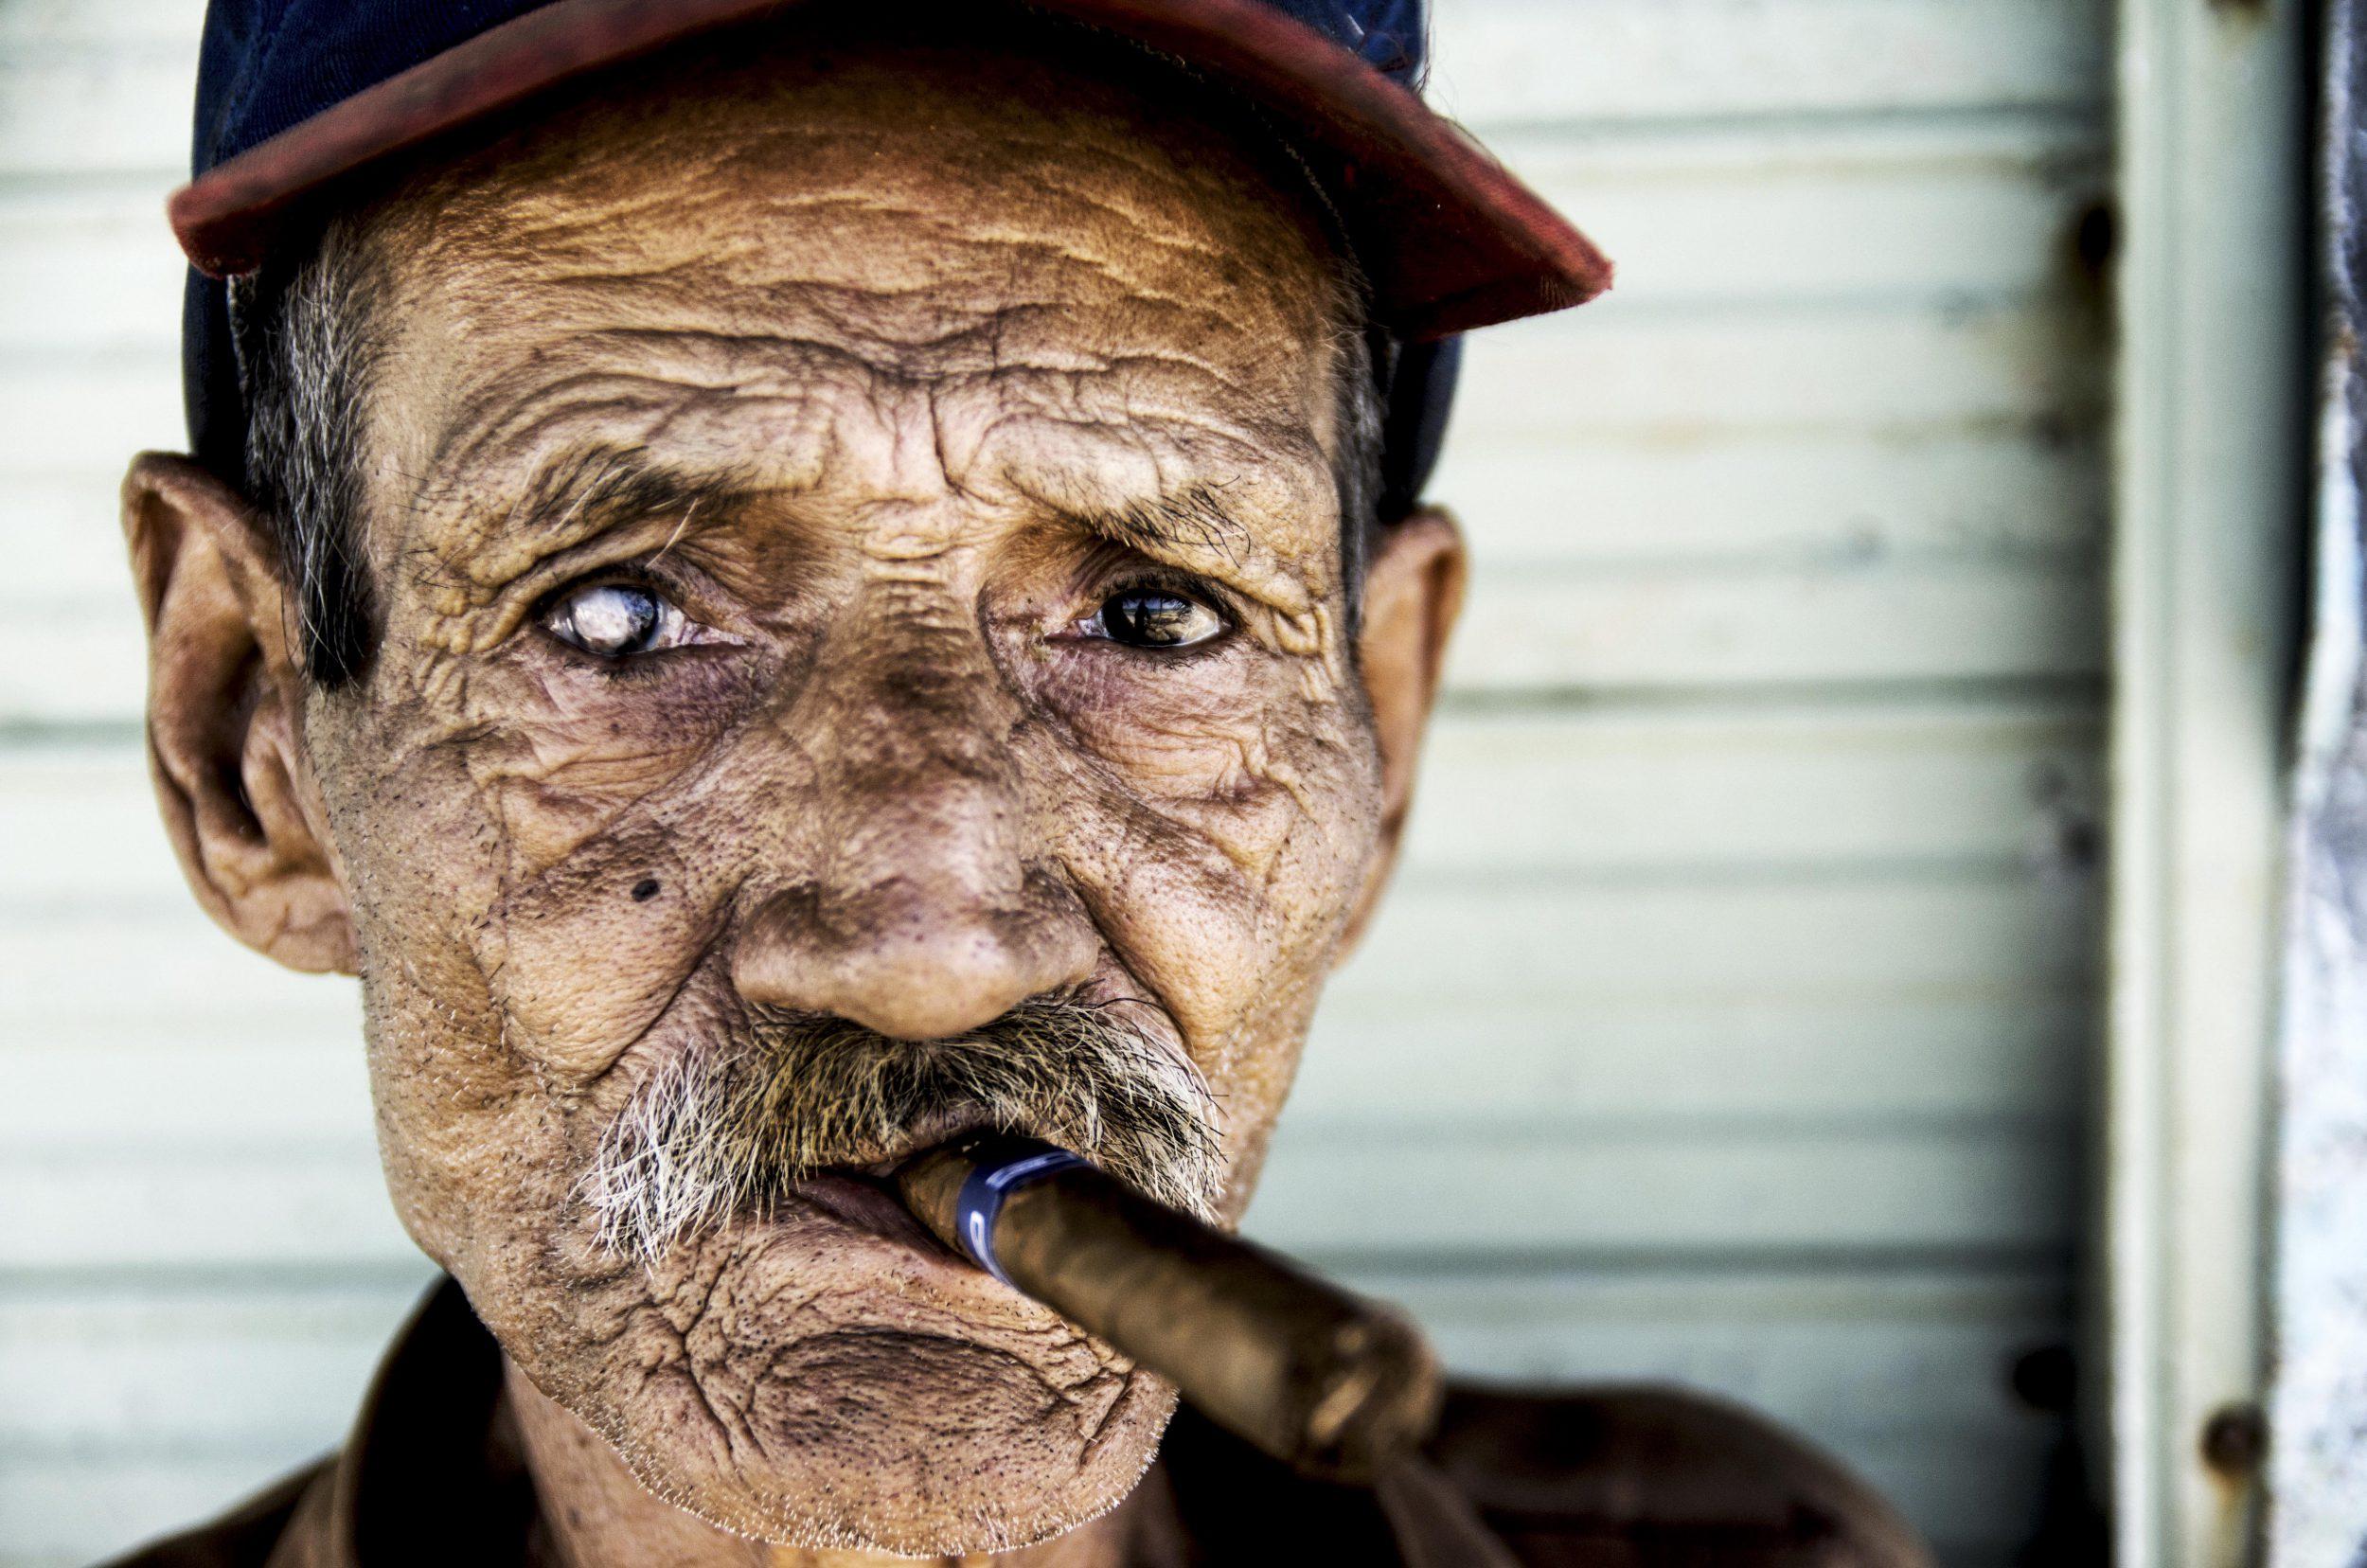 Man with a cigar, Cuba (by Thai Neave, travel photographer)